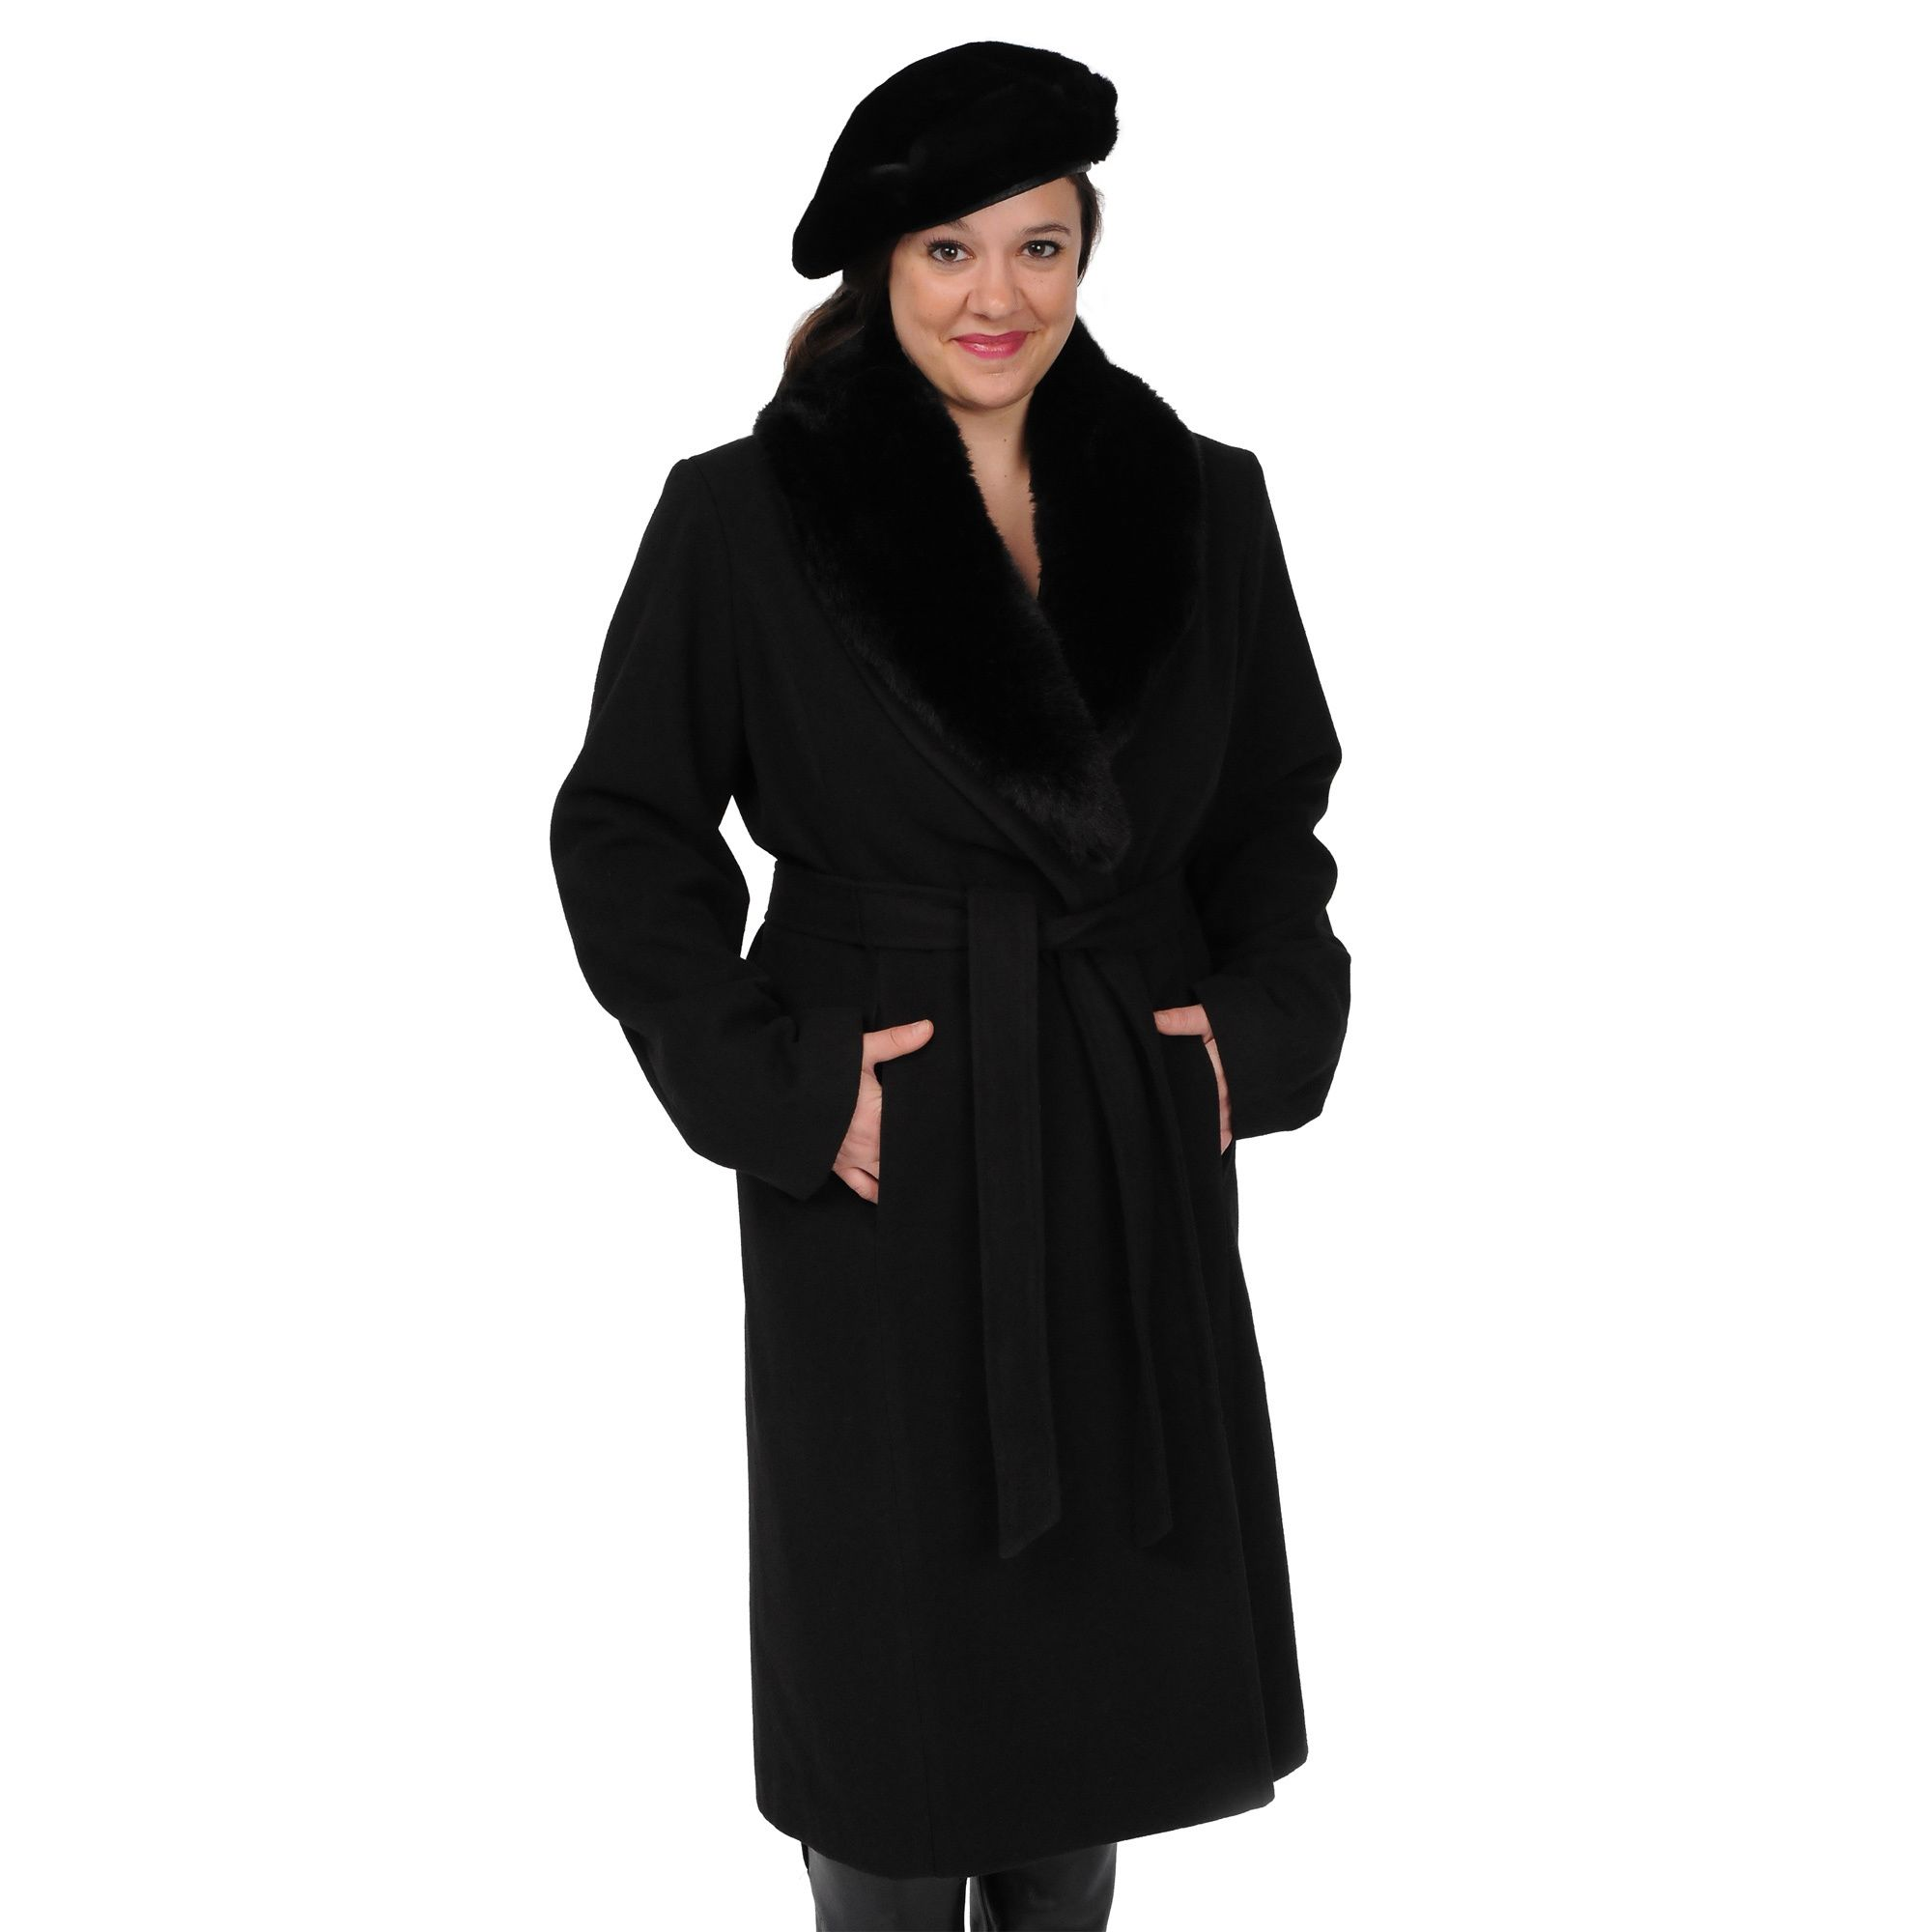 Our Best Women S Outerwear Deals Women S Outerwear Wool Swing Coat Outerwear Women Swing Coats [ 2000 x 2000 Pixel ]